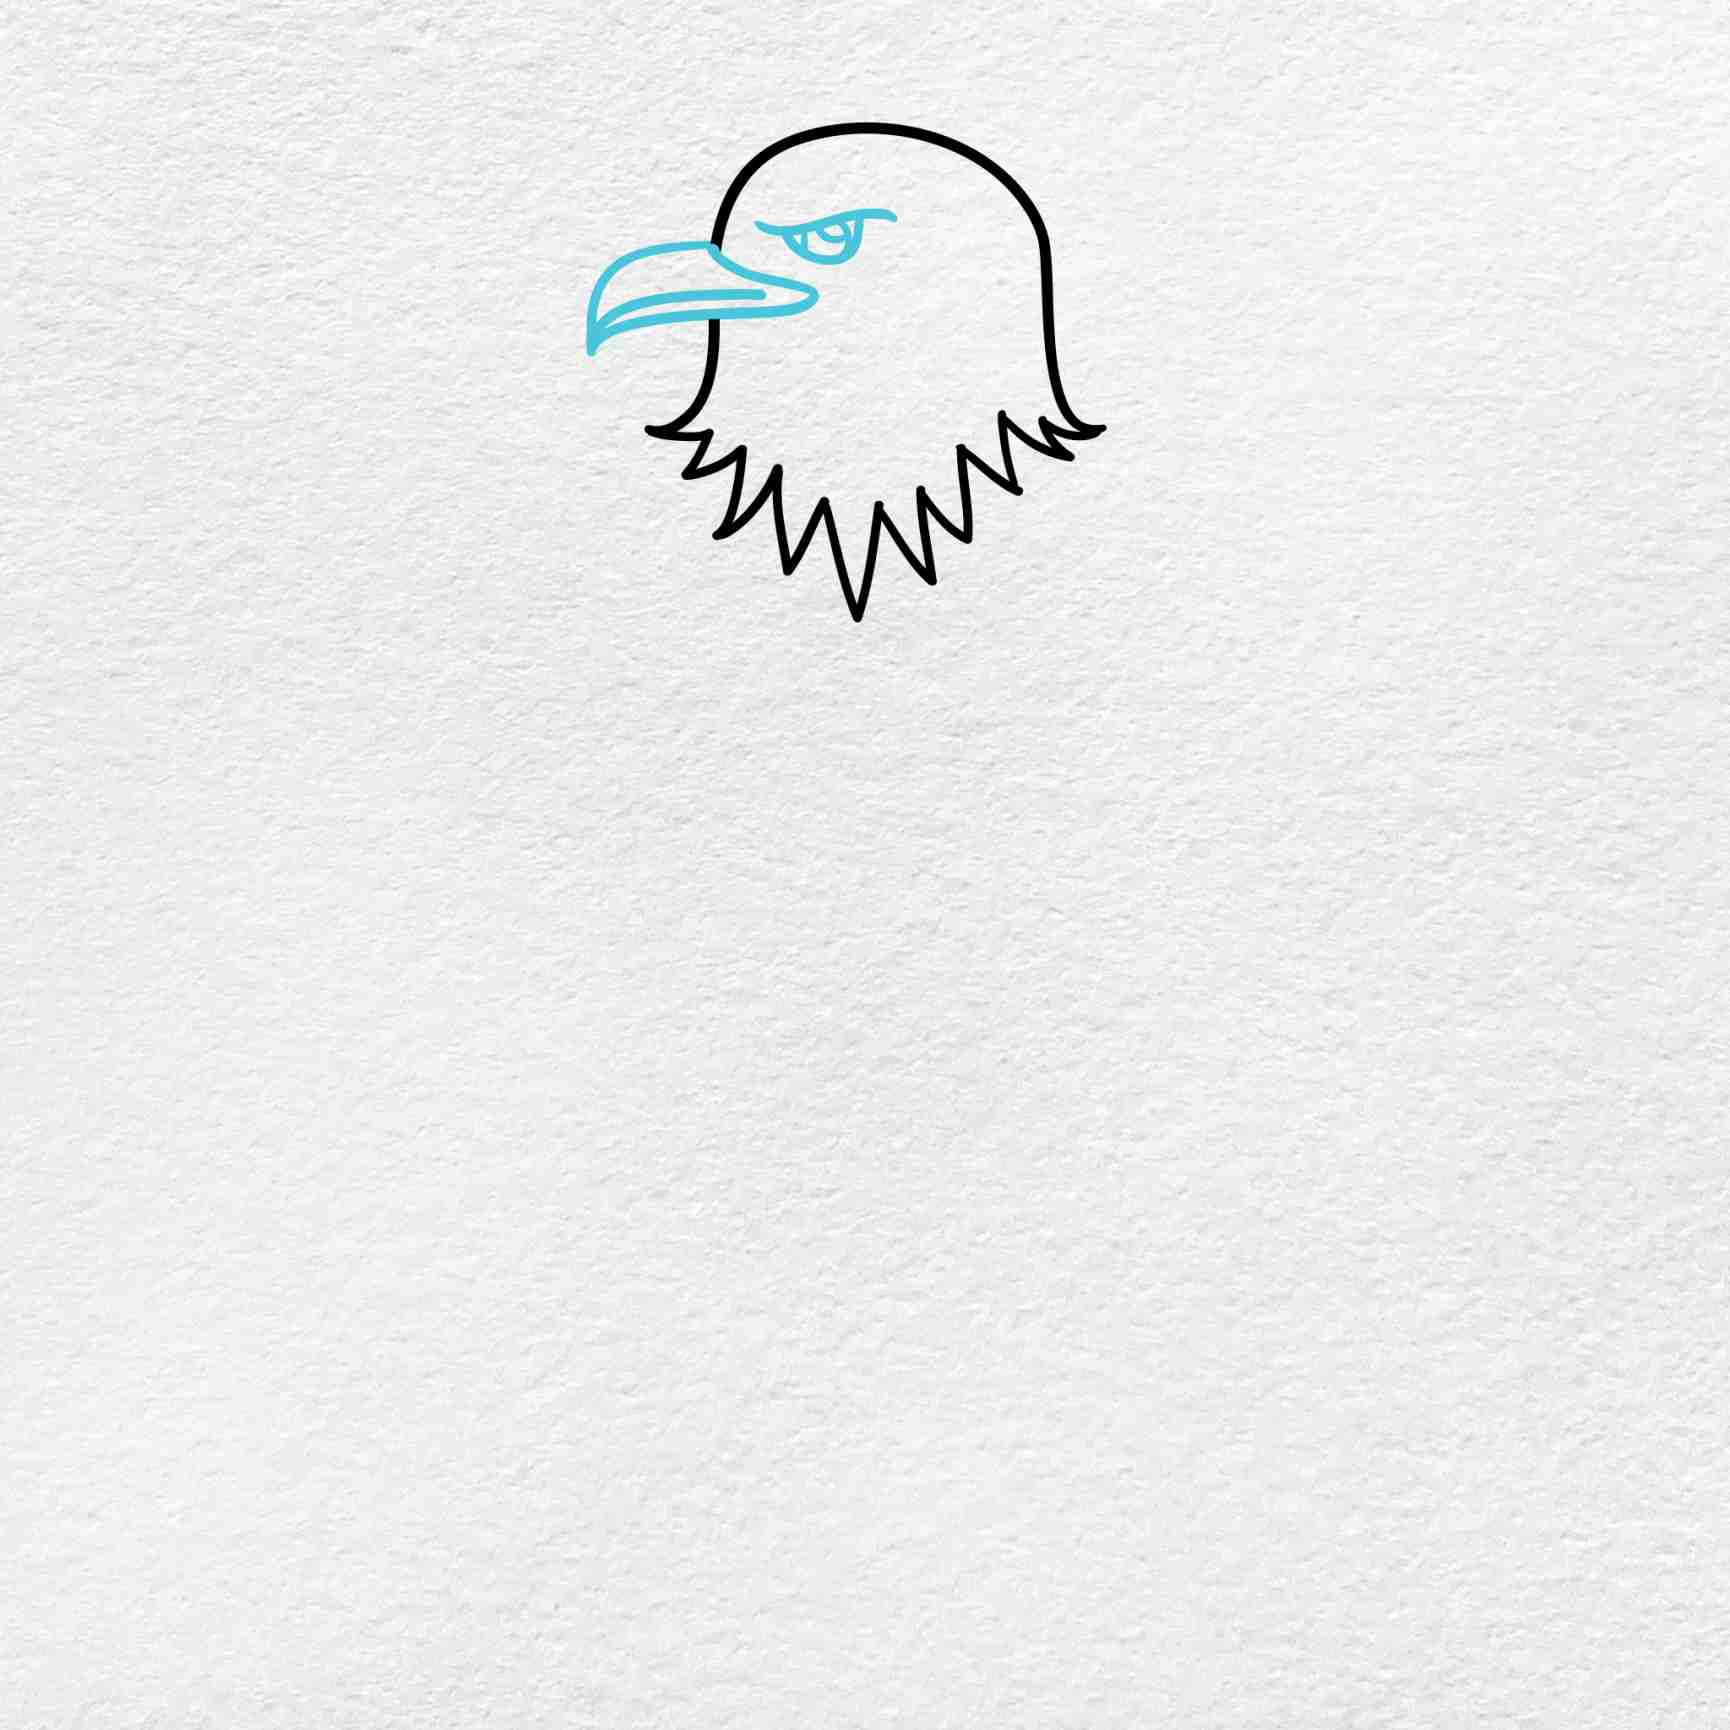 Bald Eagle Drawing: Step 2